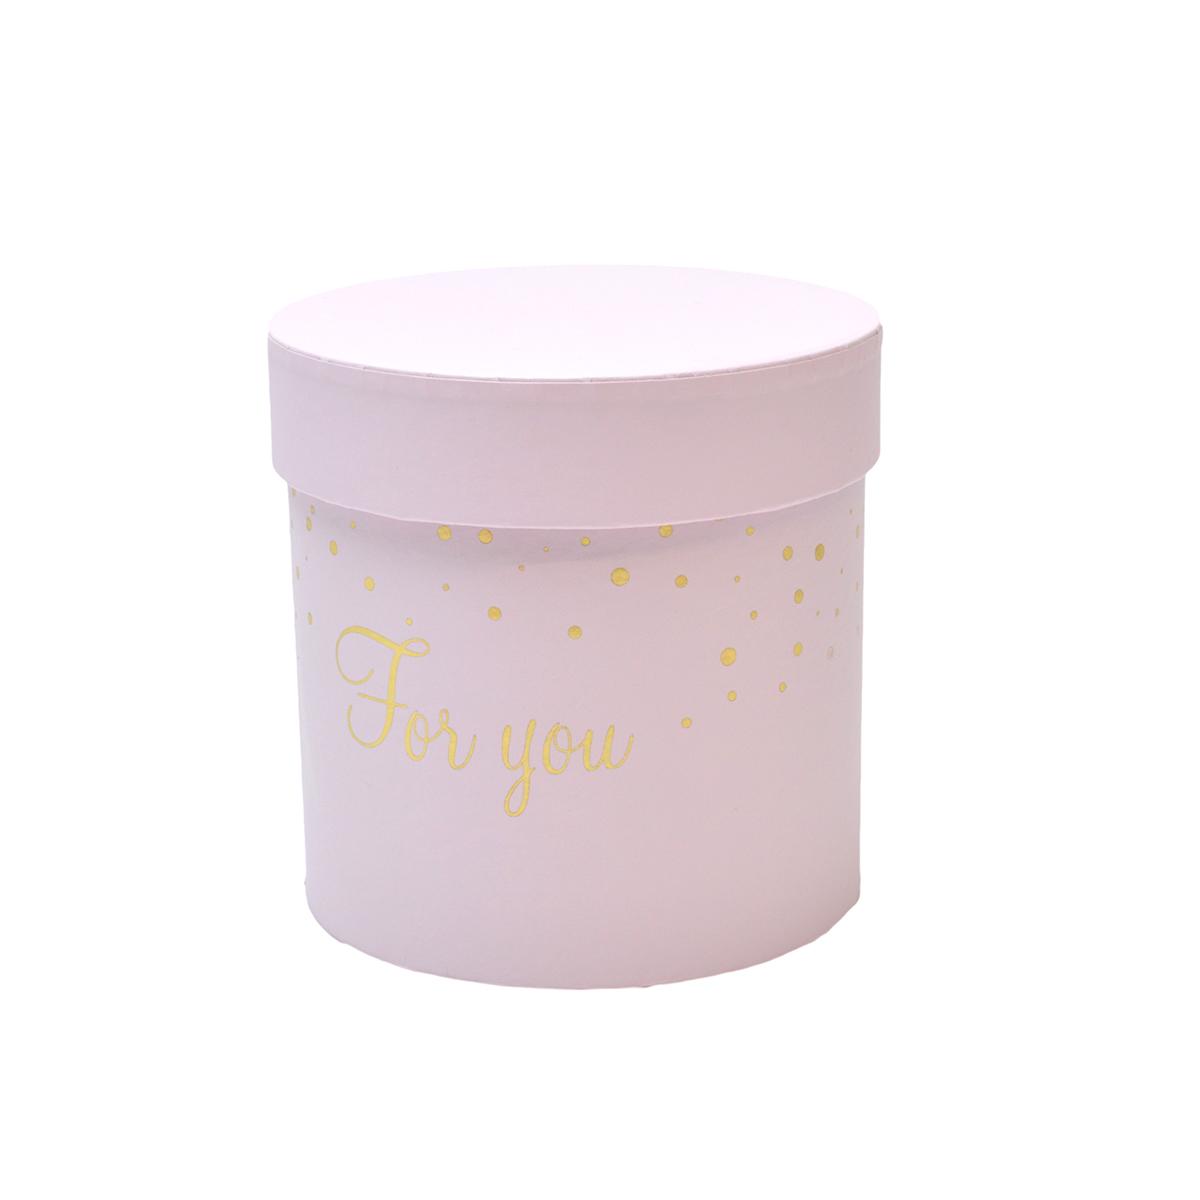 Cutie cilindrica fara manere for you roz pal